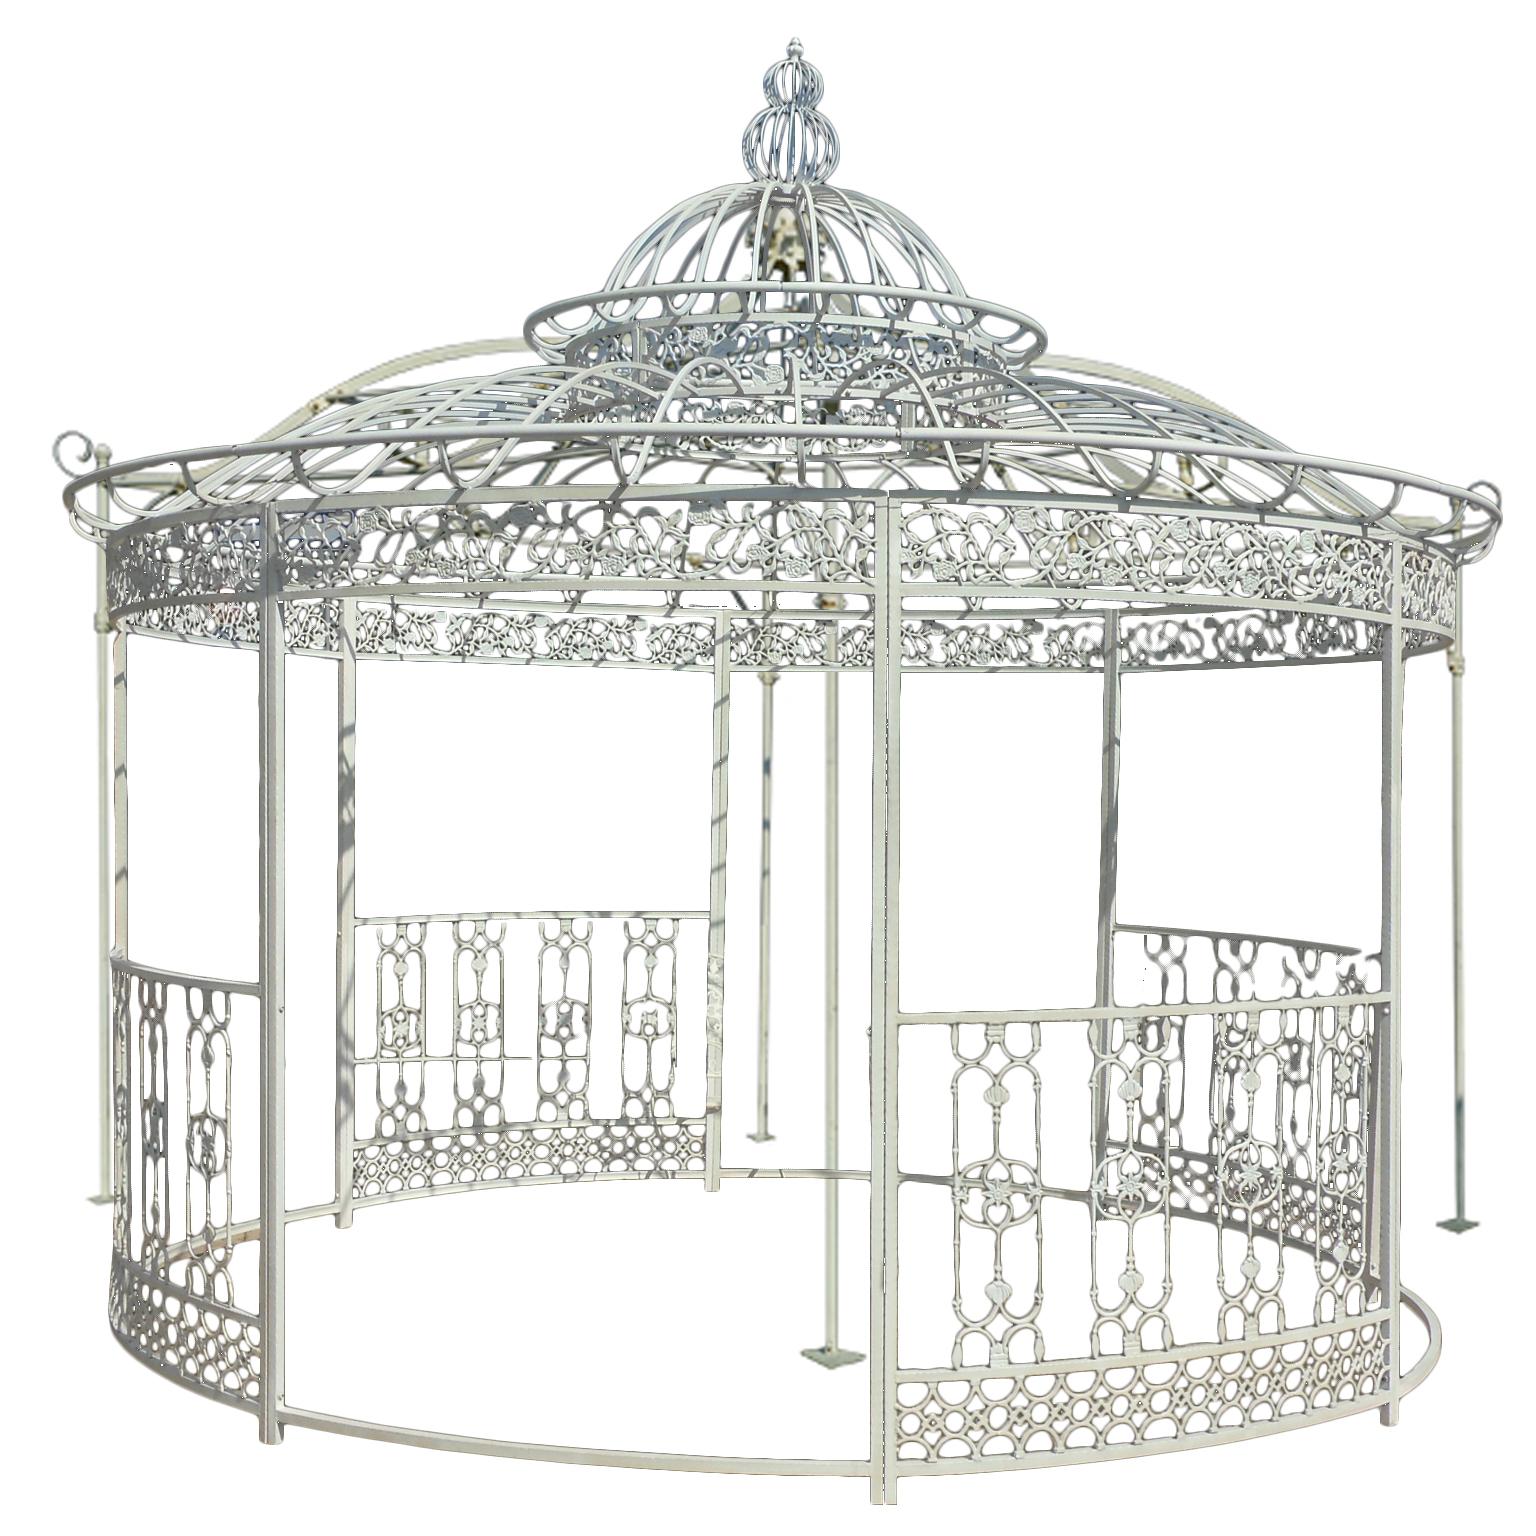 Full Size of Pavillon Eisen Aus Pietre E Arredi Giardino Antiquitten Garten Wohnzimmer Pavillon Eisen